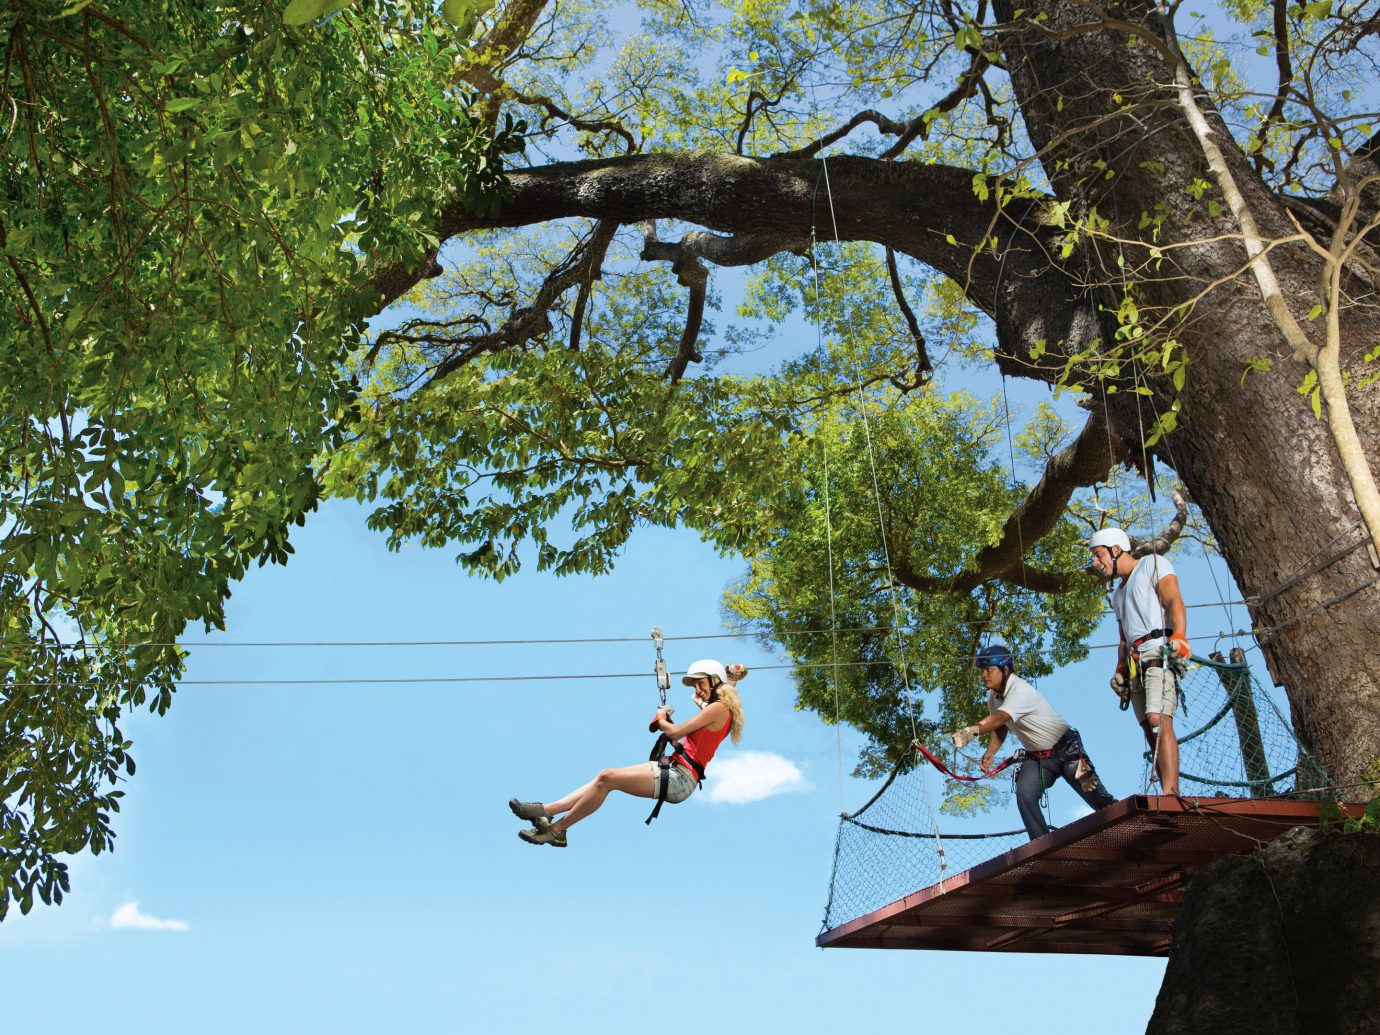 Ziplining in Guanacaste, Costa Rica